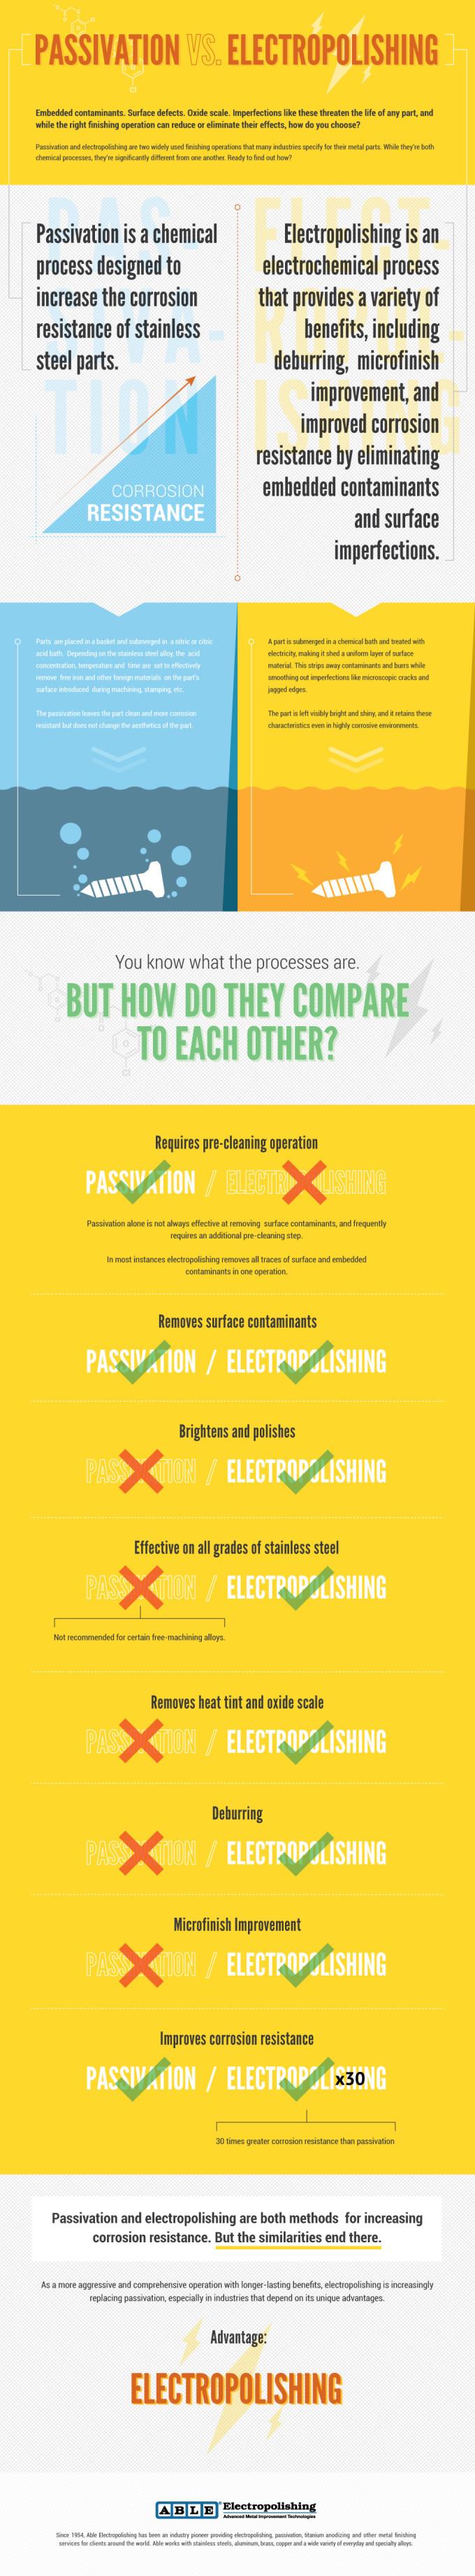 AbleElectropolishing-PassivationVsElectropolish-Infographic